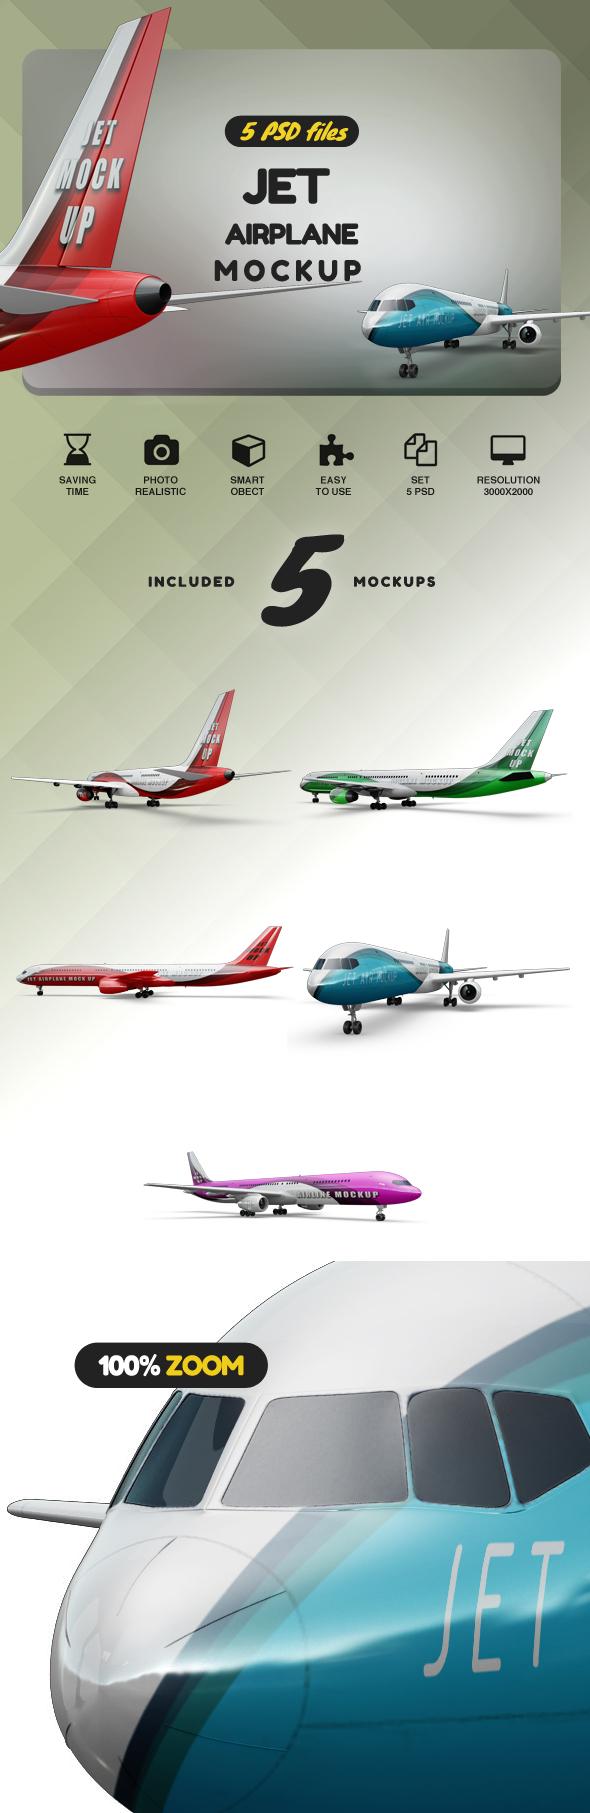 Jet Airplane Mockup example image 2